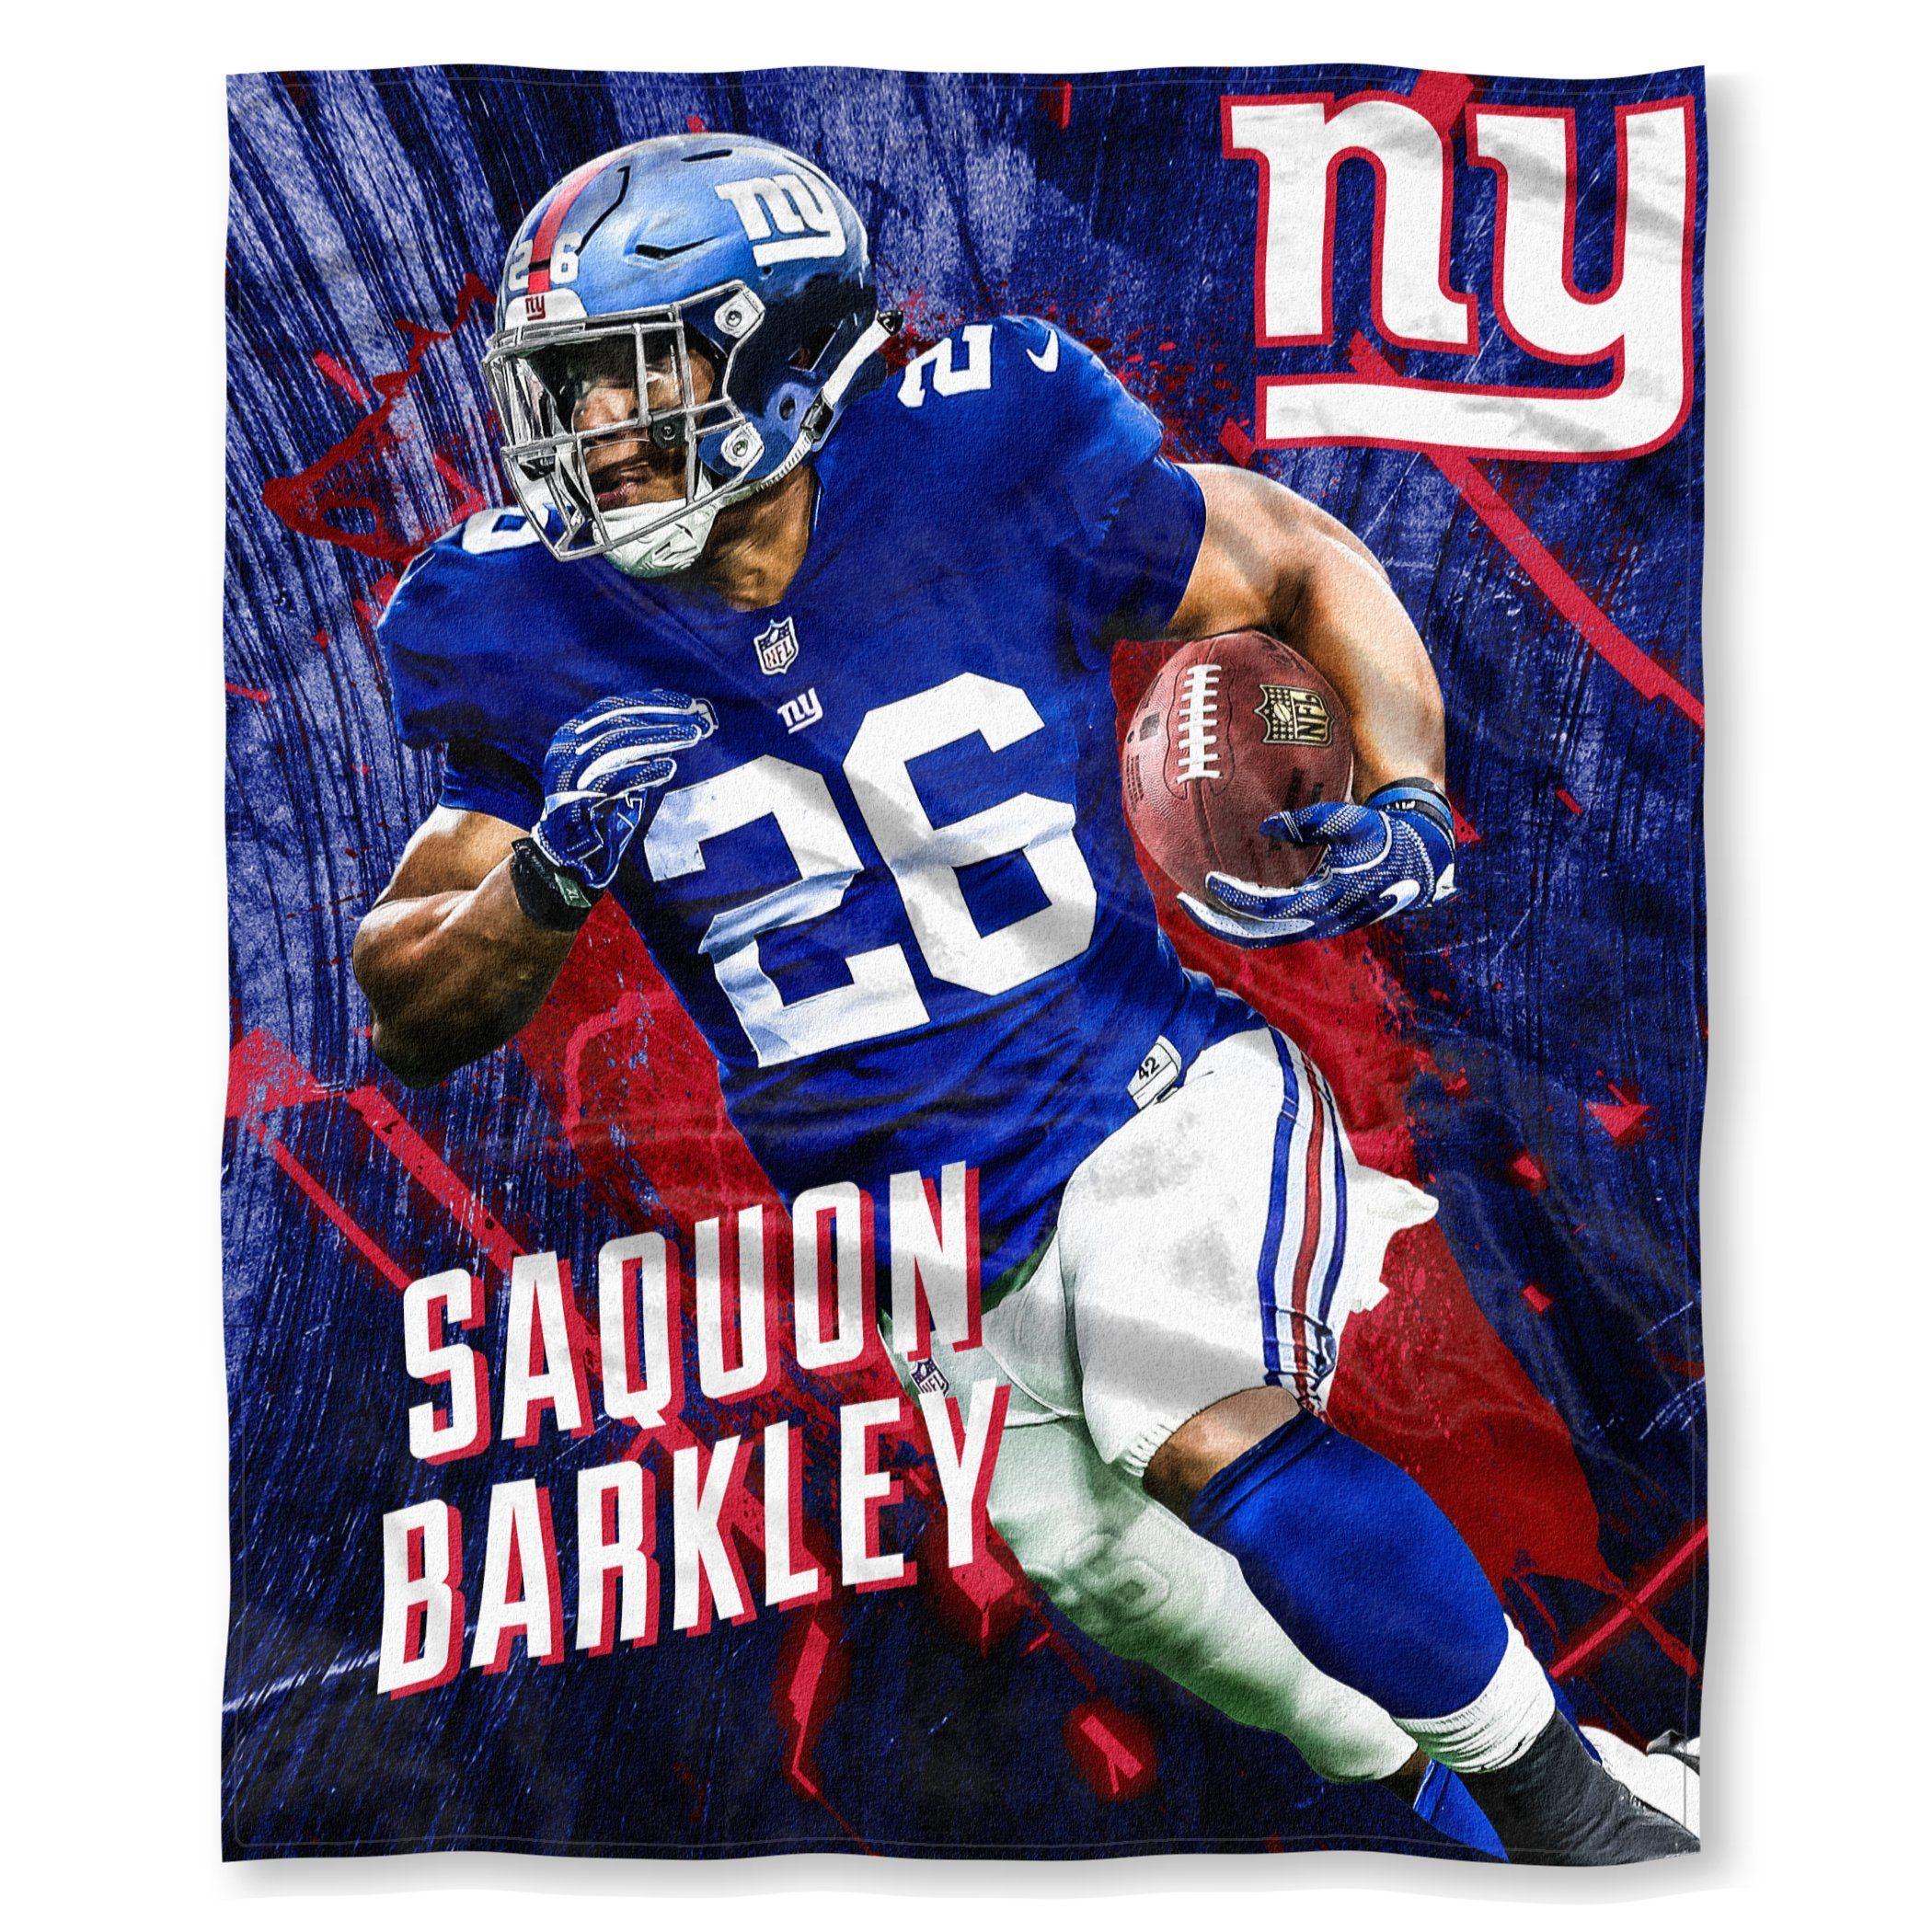 half off 70280 ab264 NY Giants - Saquon Barkley OFFICIAL National Football League ...